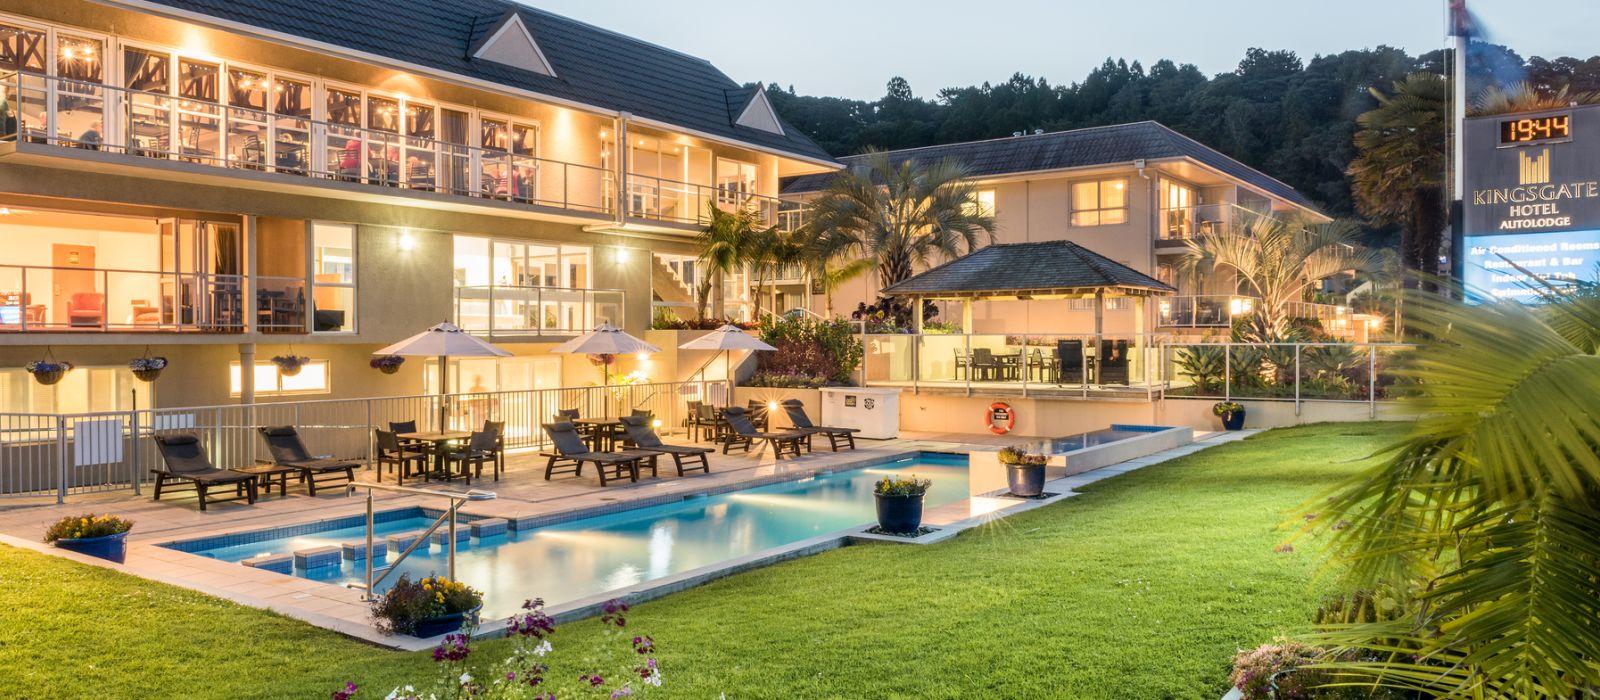 Hotel The Kingsgate  Autolodge Paihia New Zealand